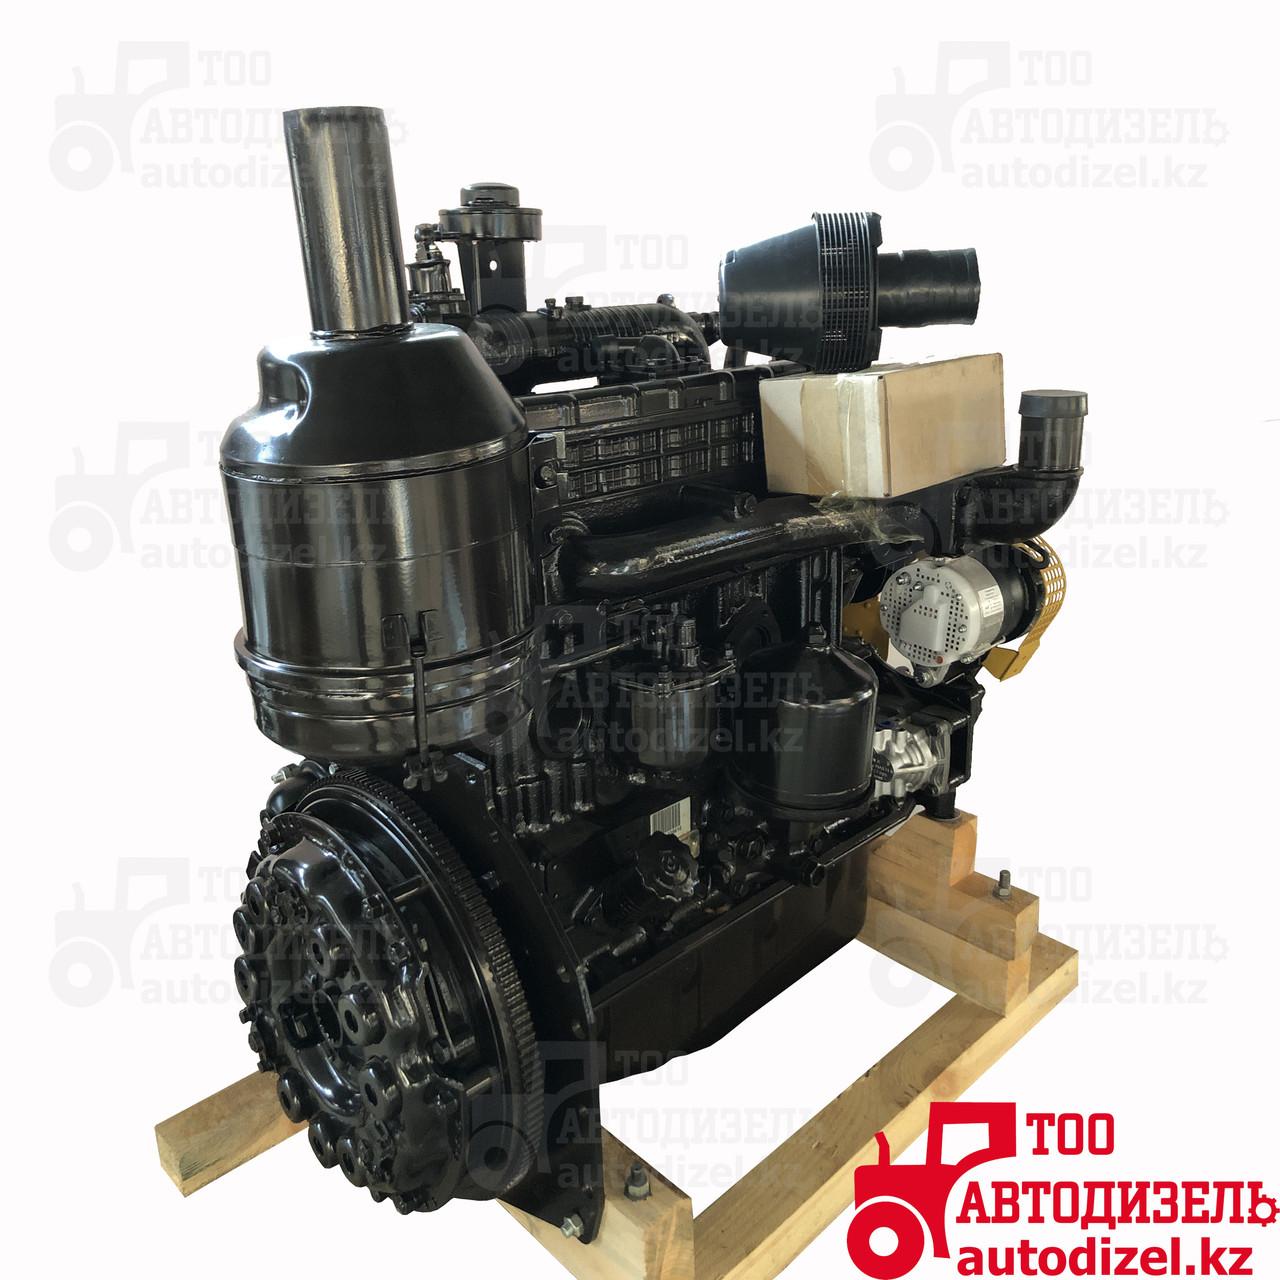 Двигатель Д-243-91М / 648 на МТЗ (ТНВД Моторпал)